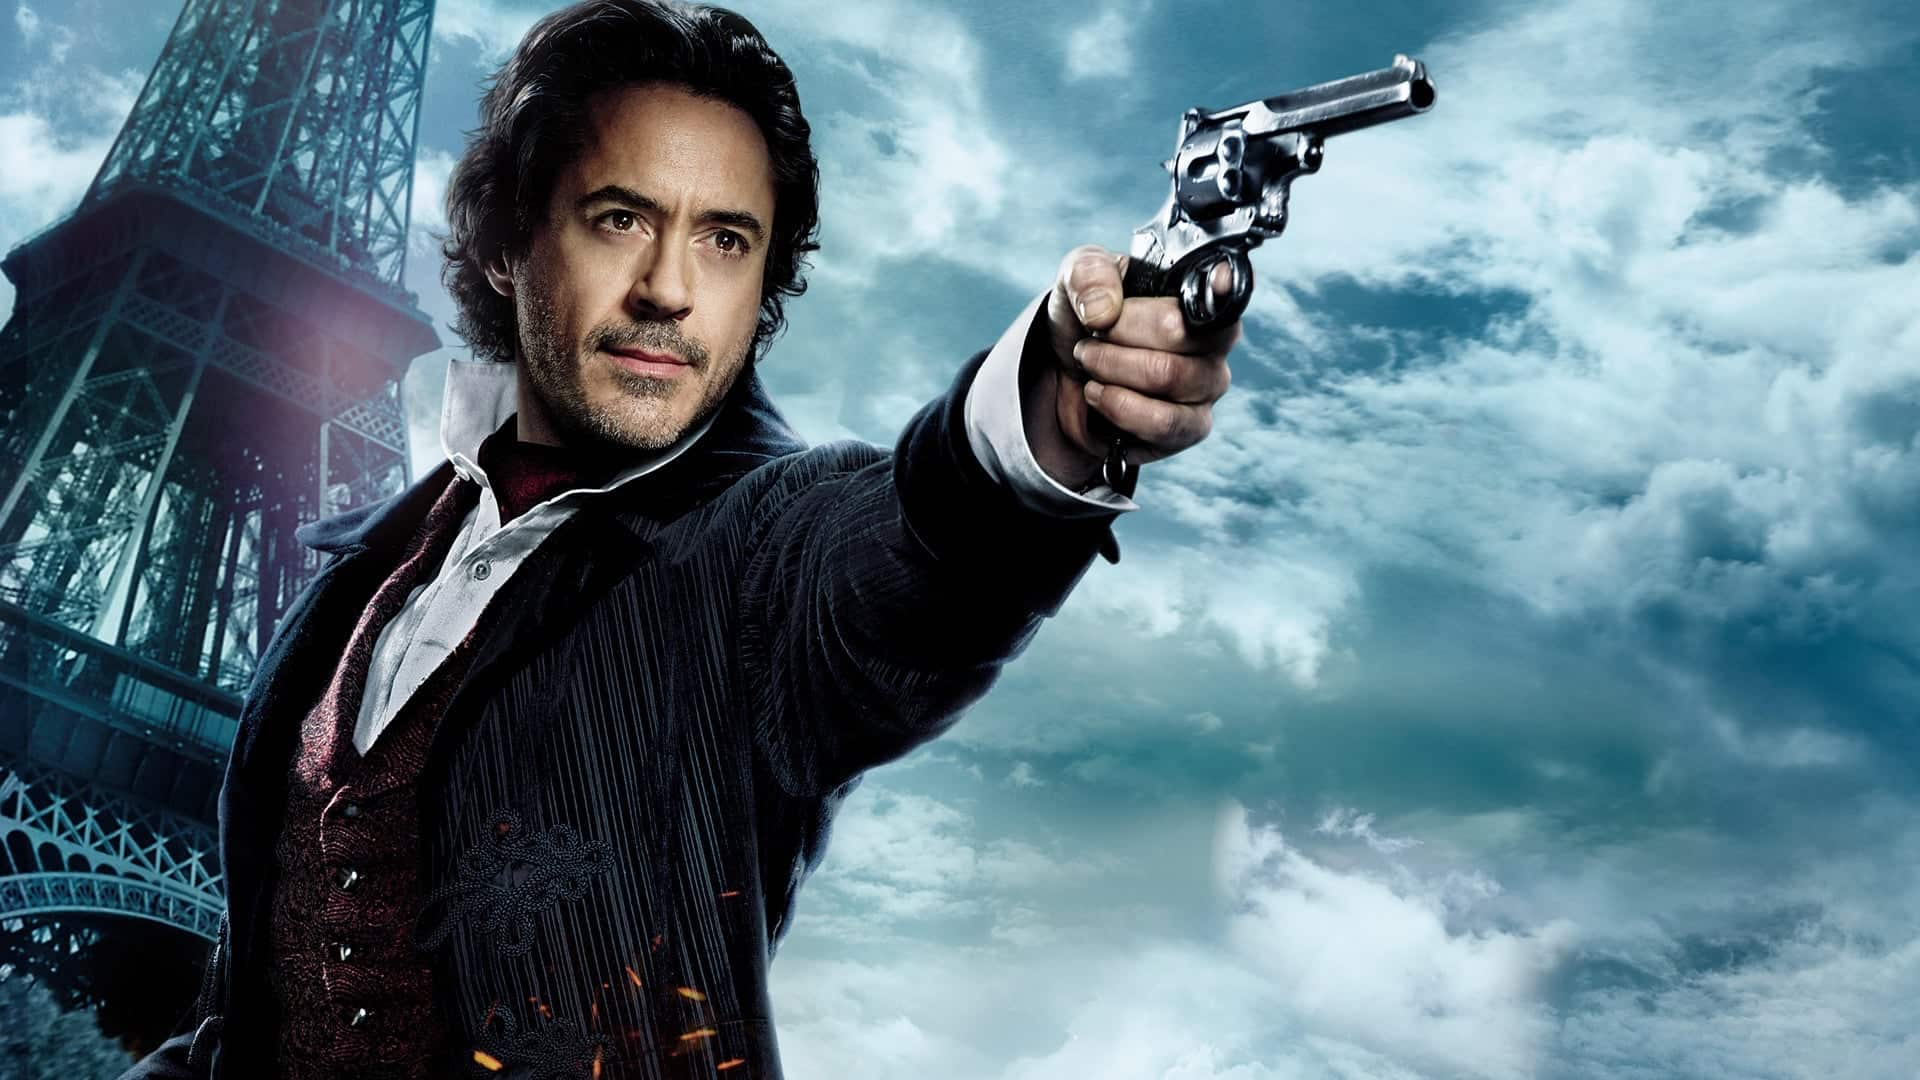 Sherlock Holmes 3: Robert Downey Jr. si prepara per il nuovo film